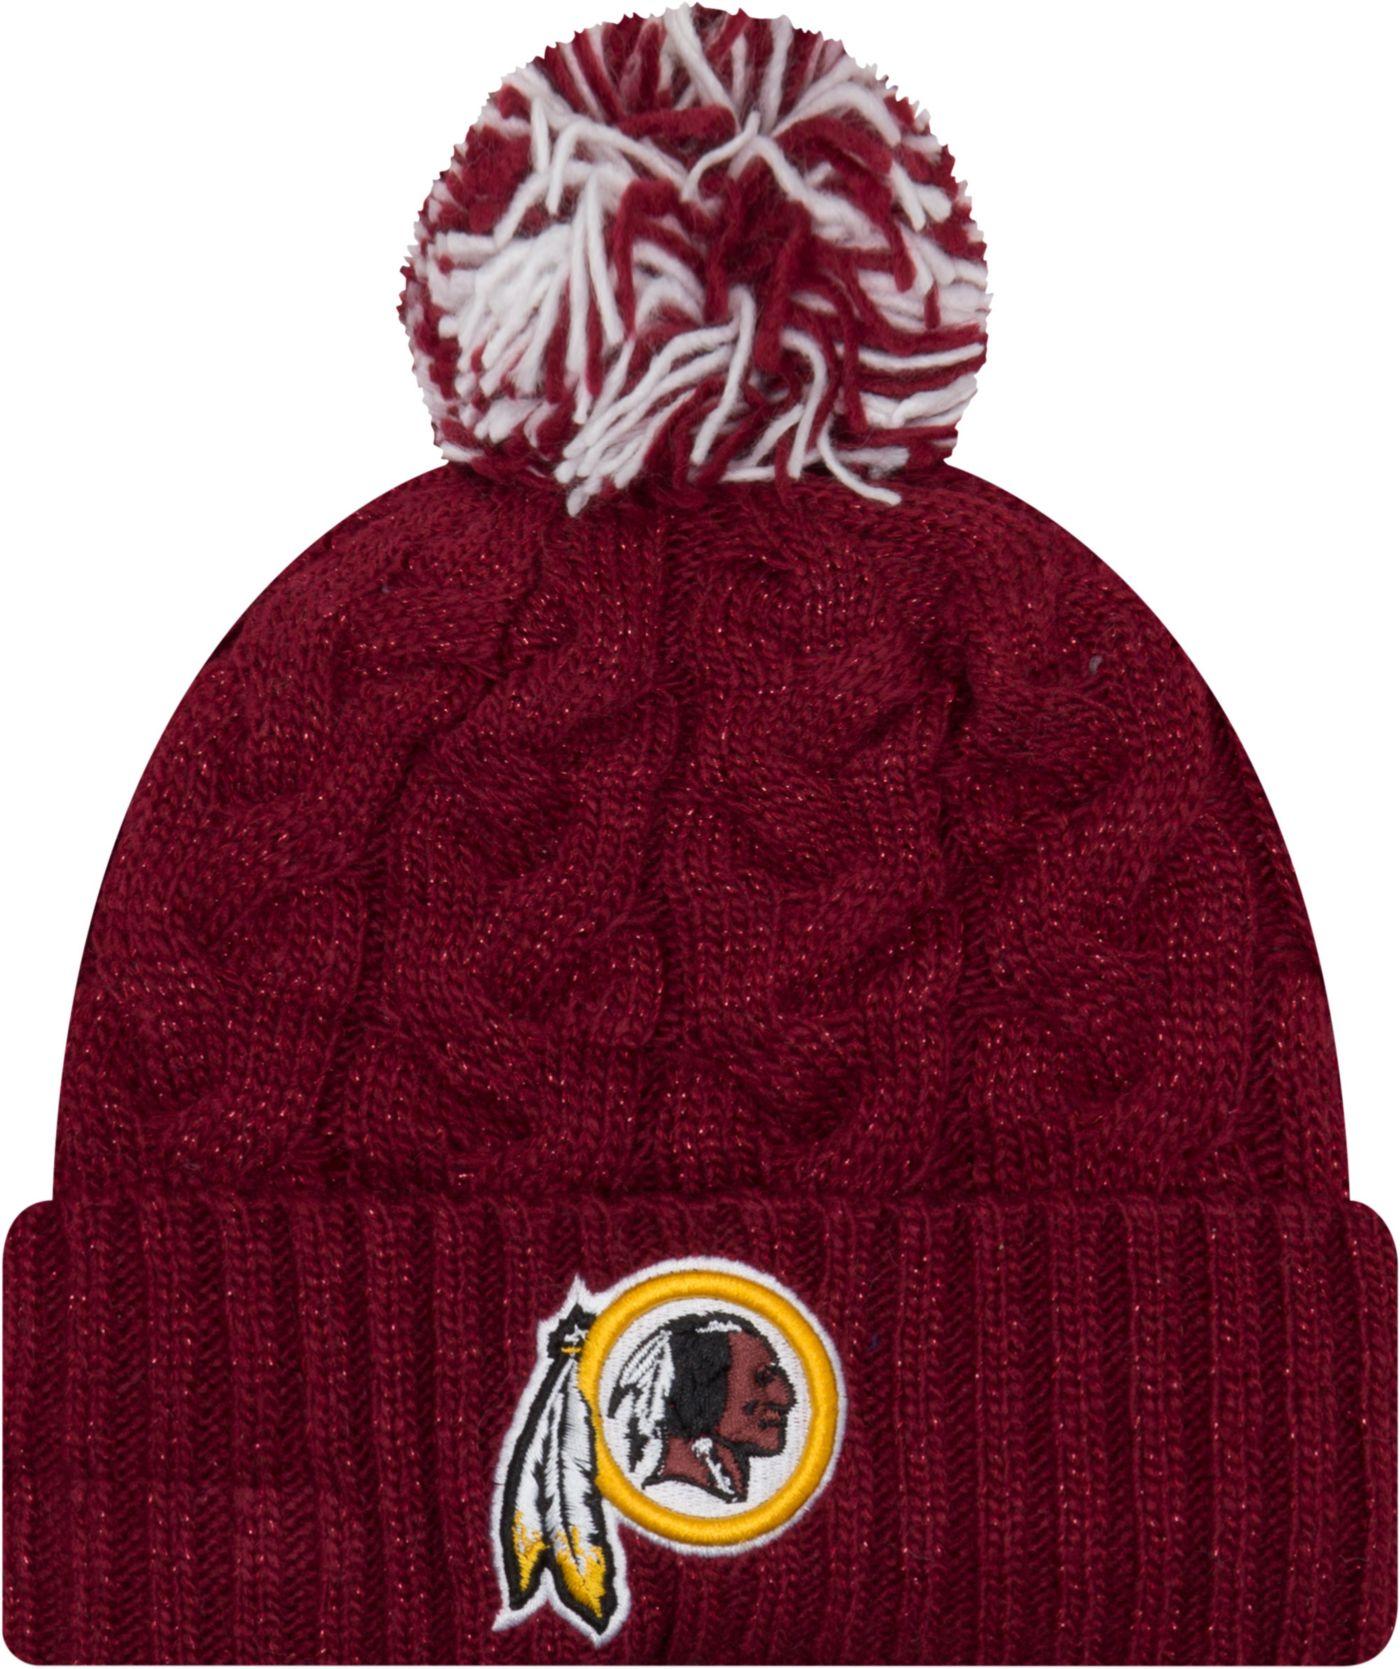 New Era Women's Washington Redskins Cozy Cable Red Pom Knit